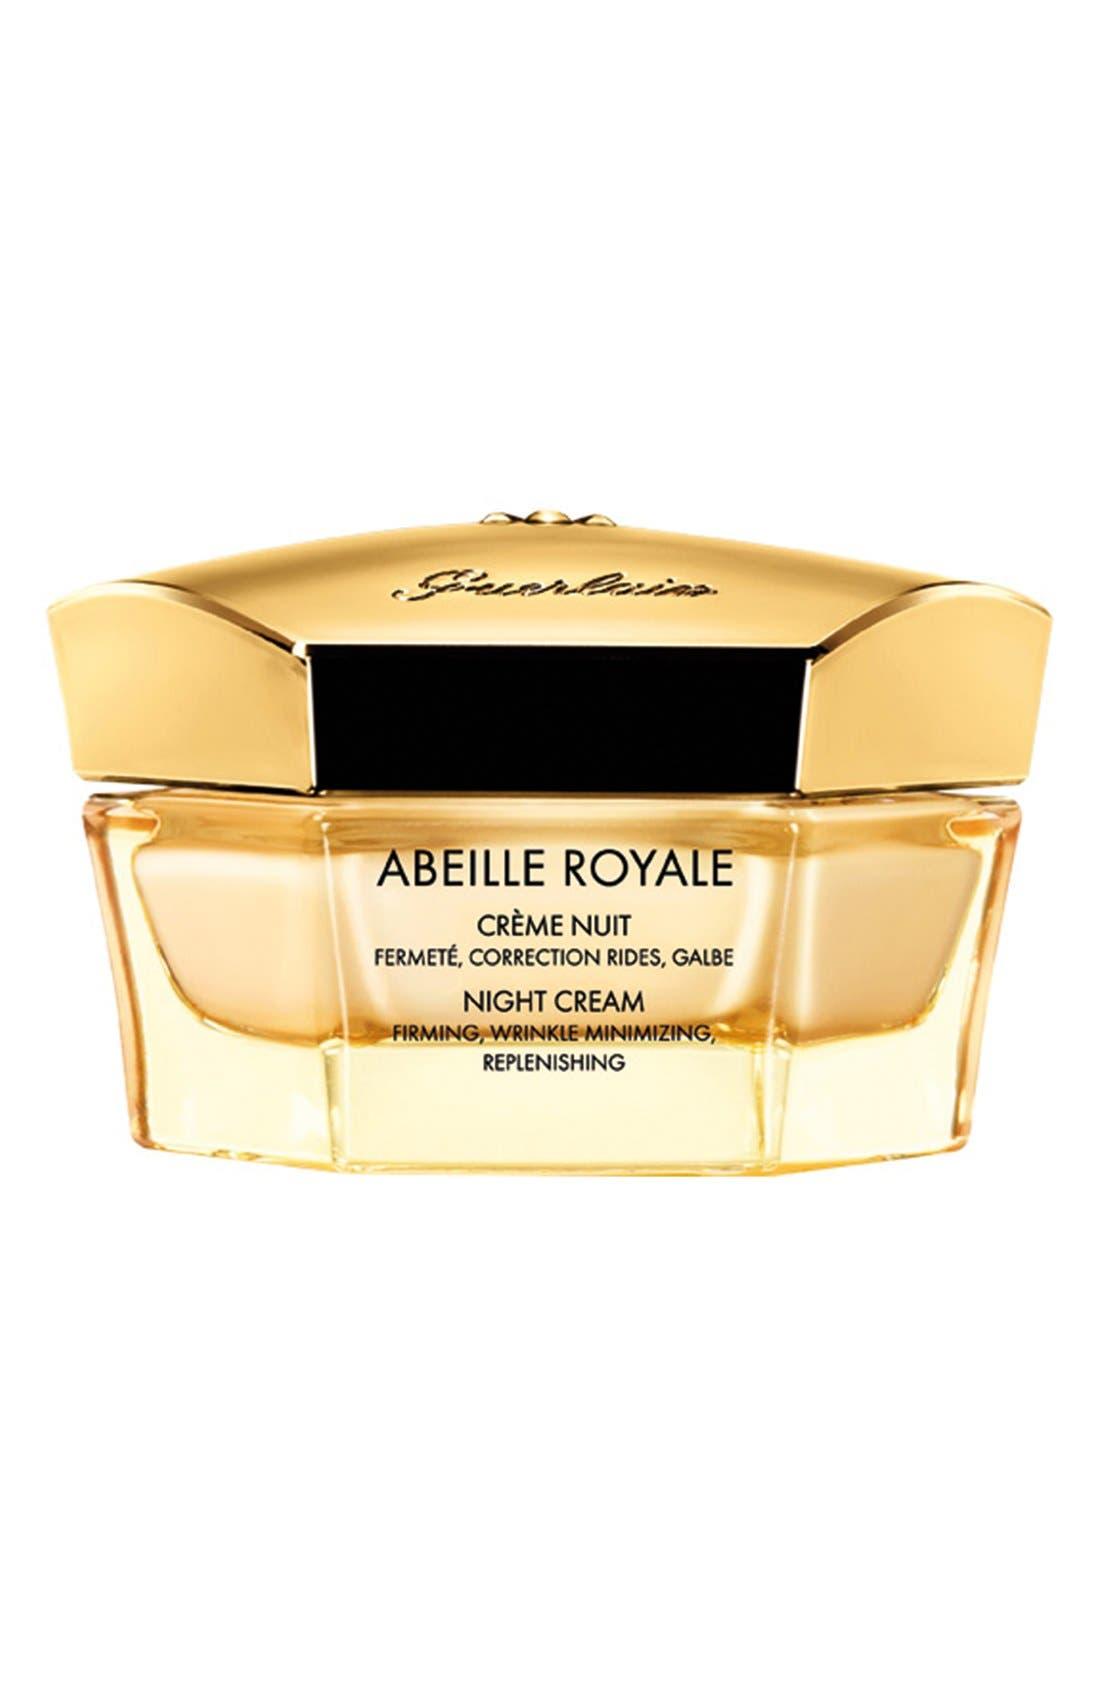 Abeille Royale Night Cream,                             Main thumbnail 1, color,                             NO COLOR